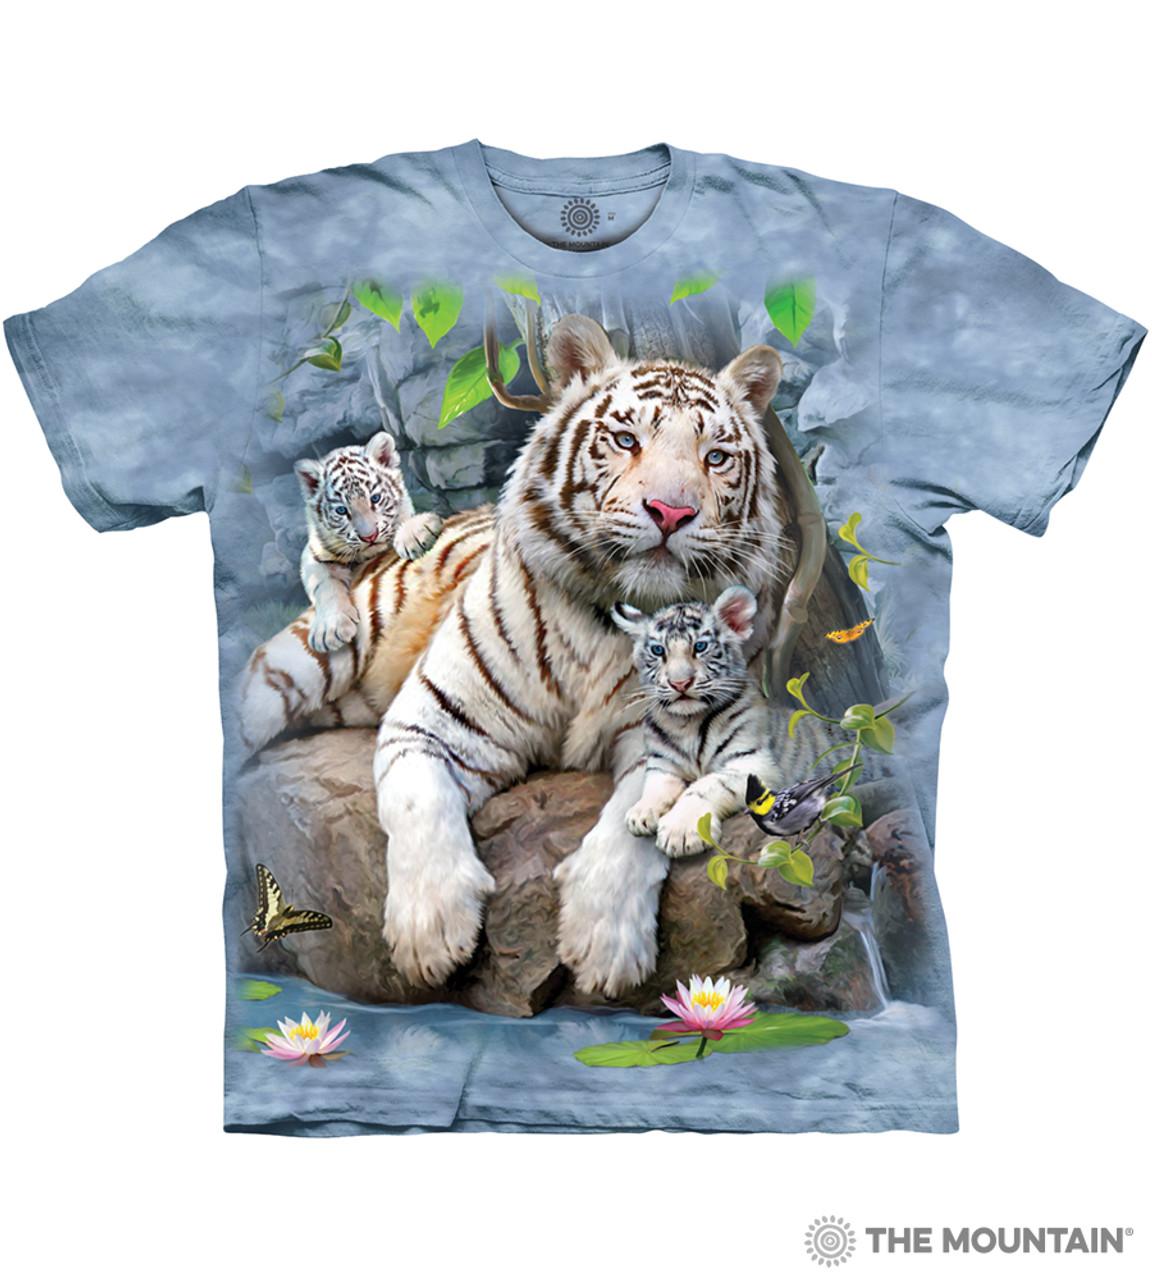 Walk on the wild side t shirt tiger animal s-3xl